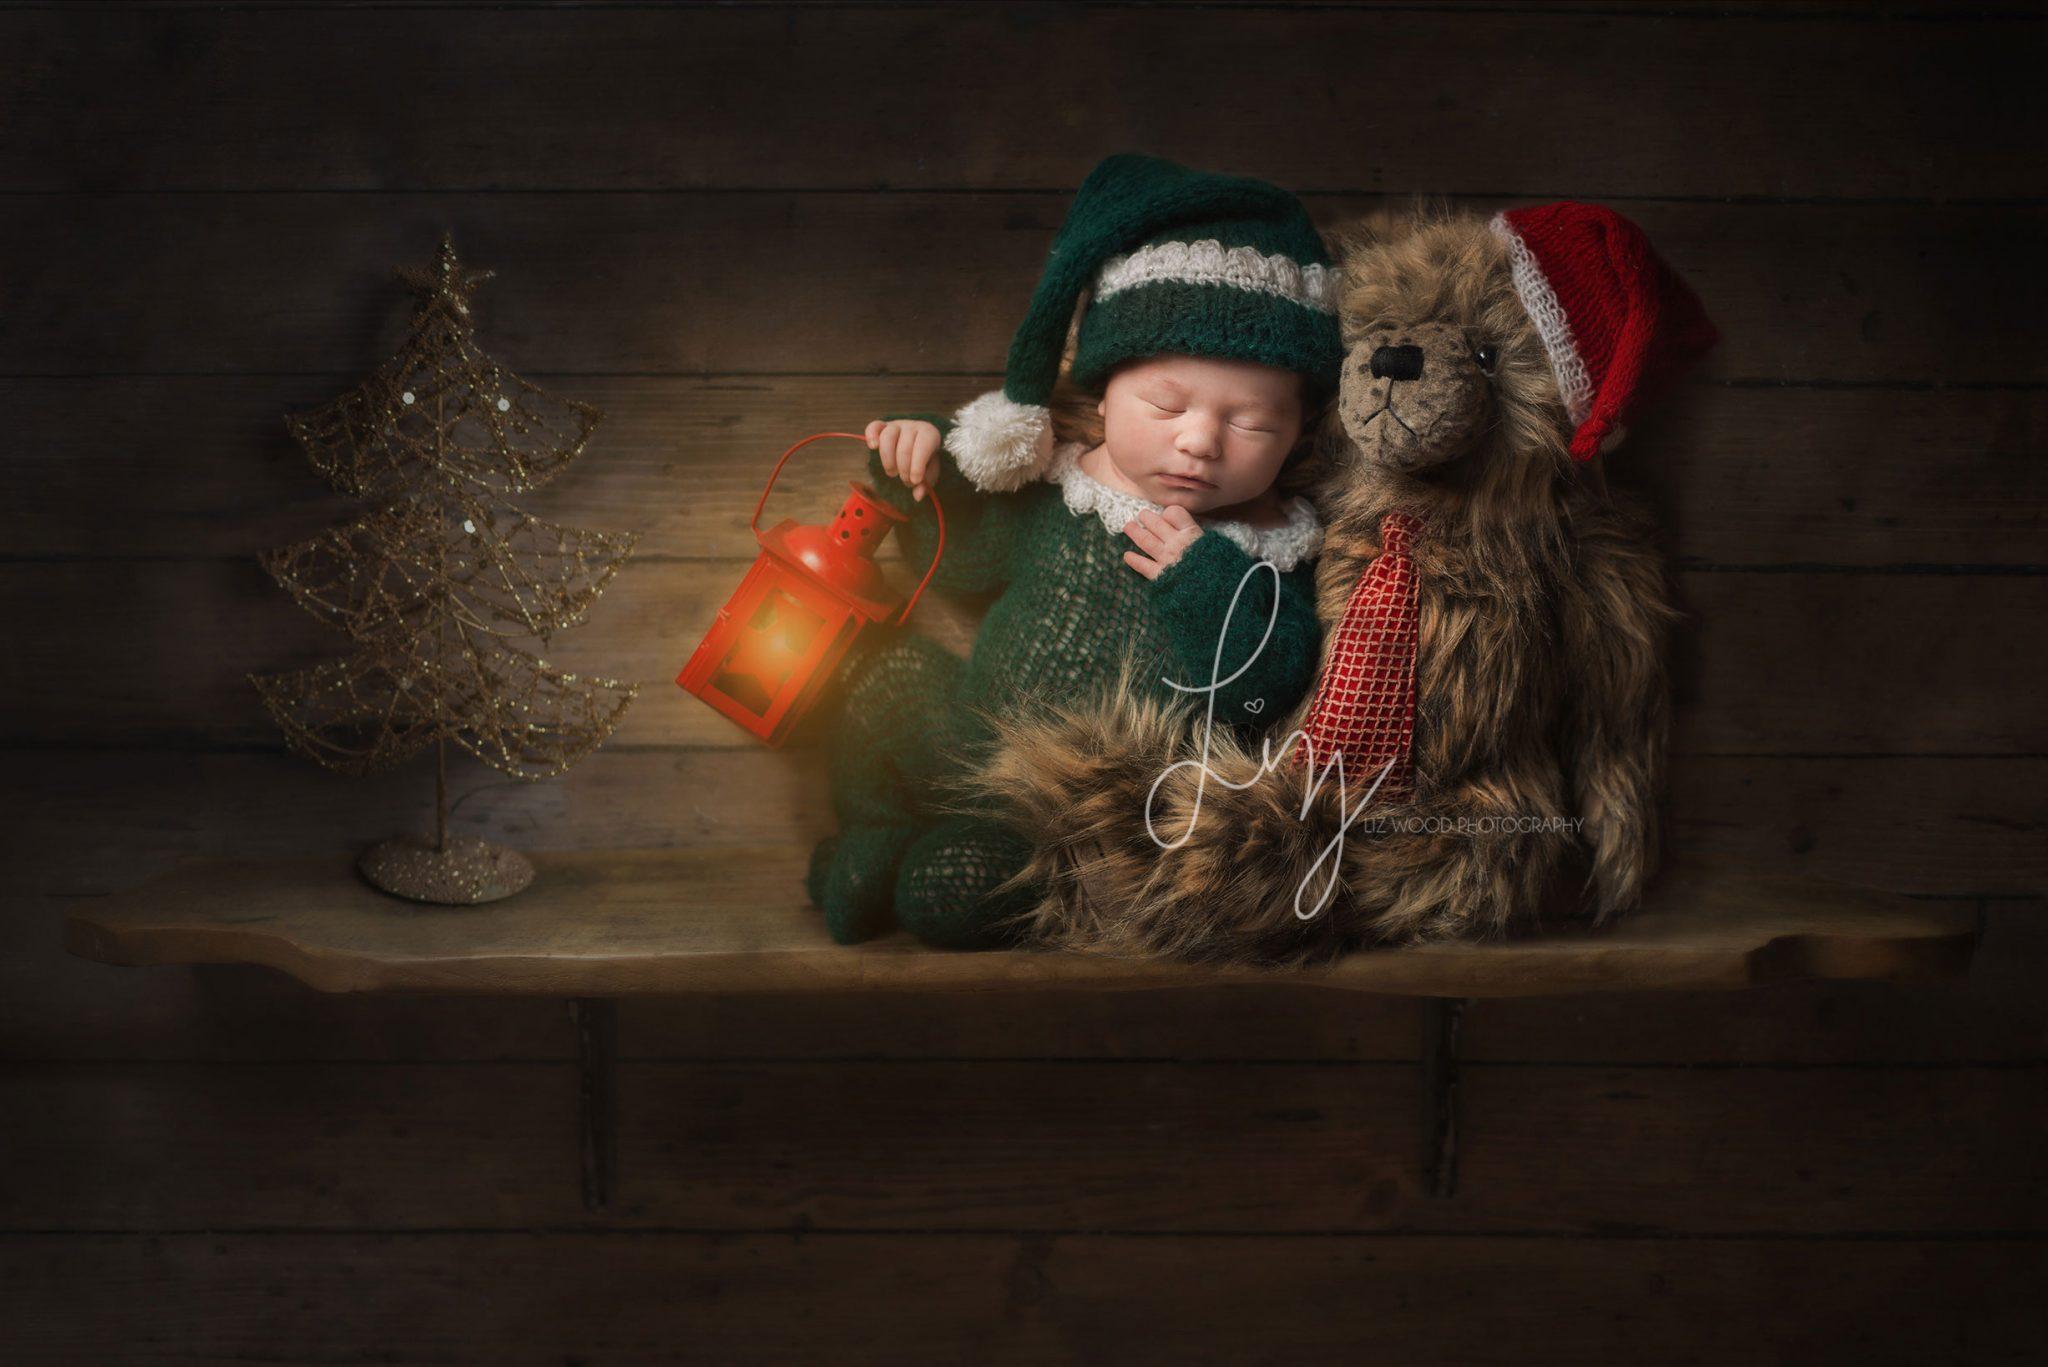 Baby on a shelf dressed as an Elf.